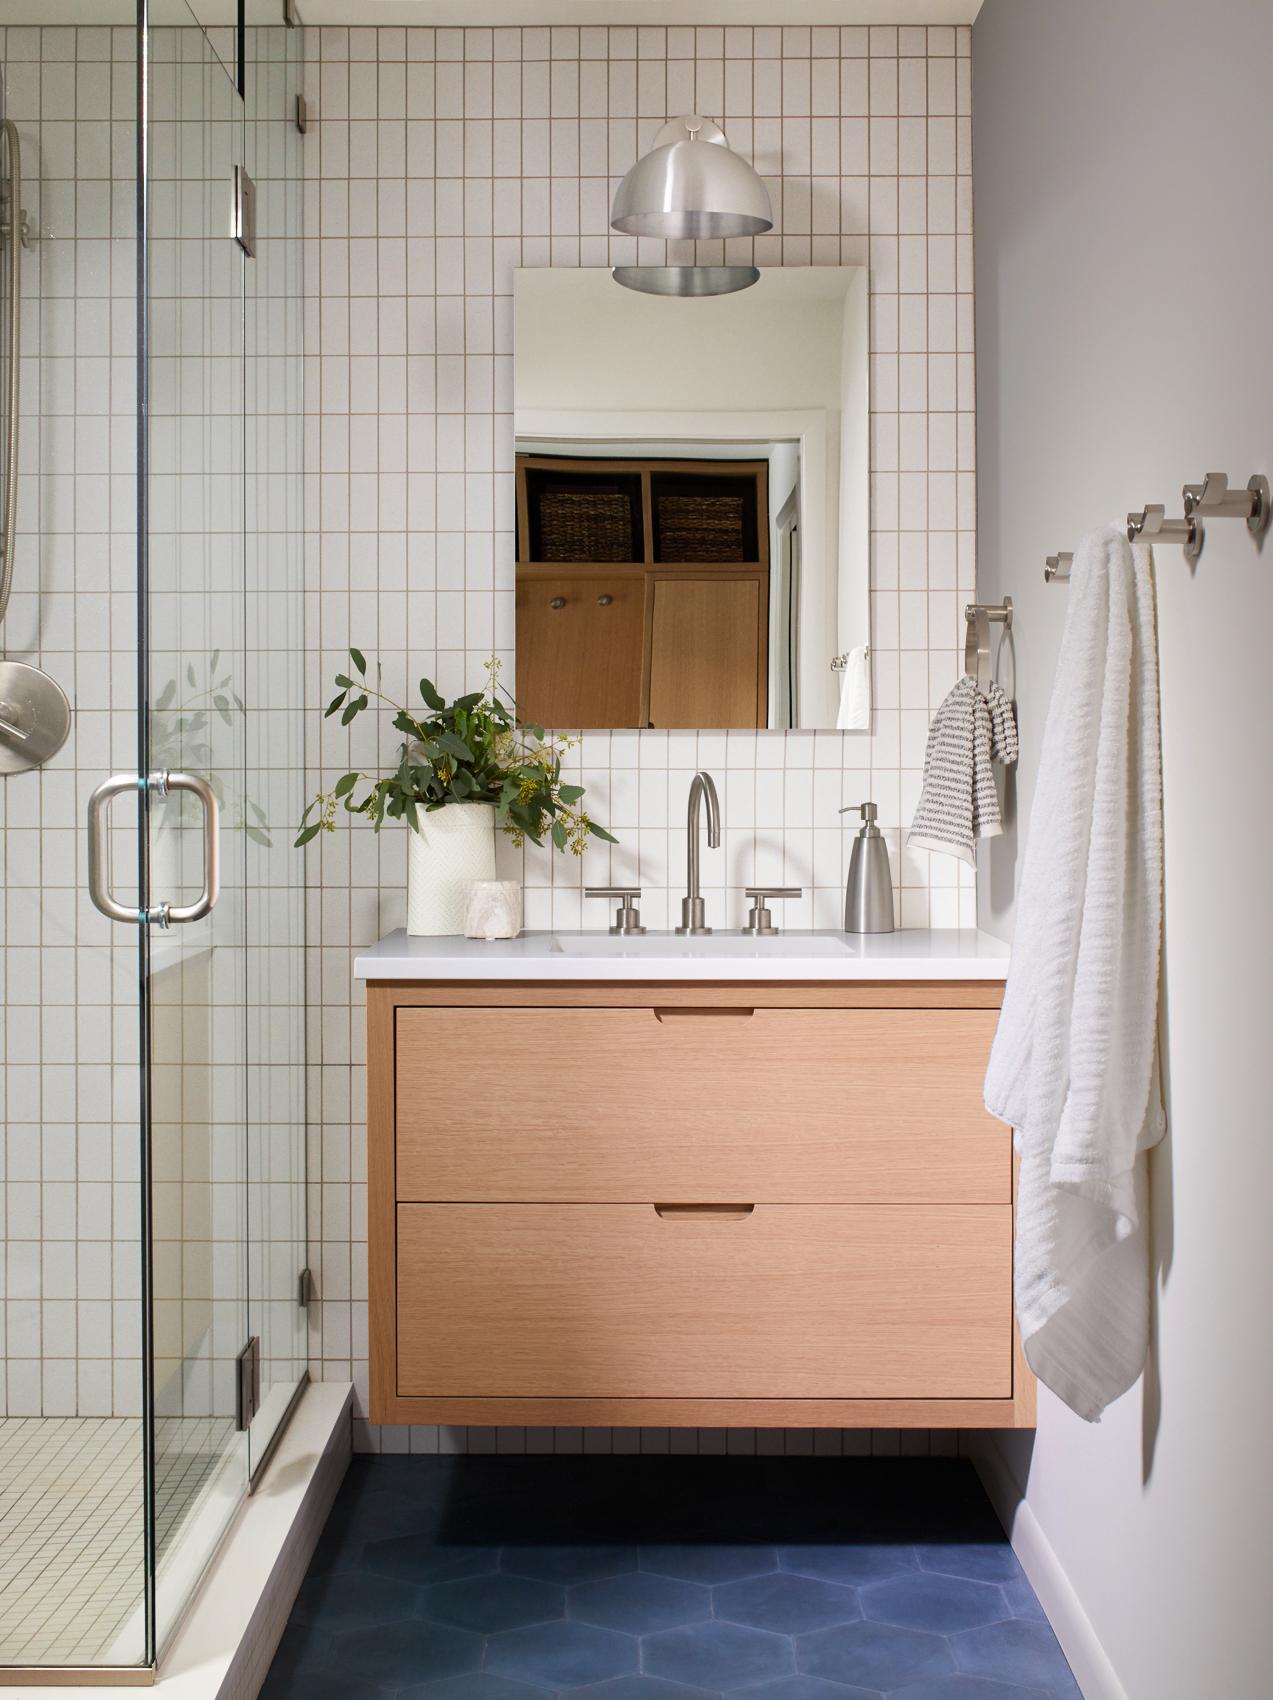 Half Bath with Custom Oak Vanity, Park Studio Sconce & Clé Cement Tile | Casework Interior Design | Portland, OR